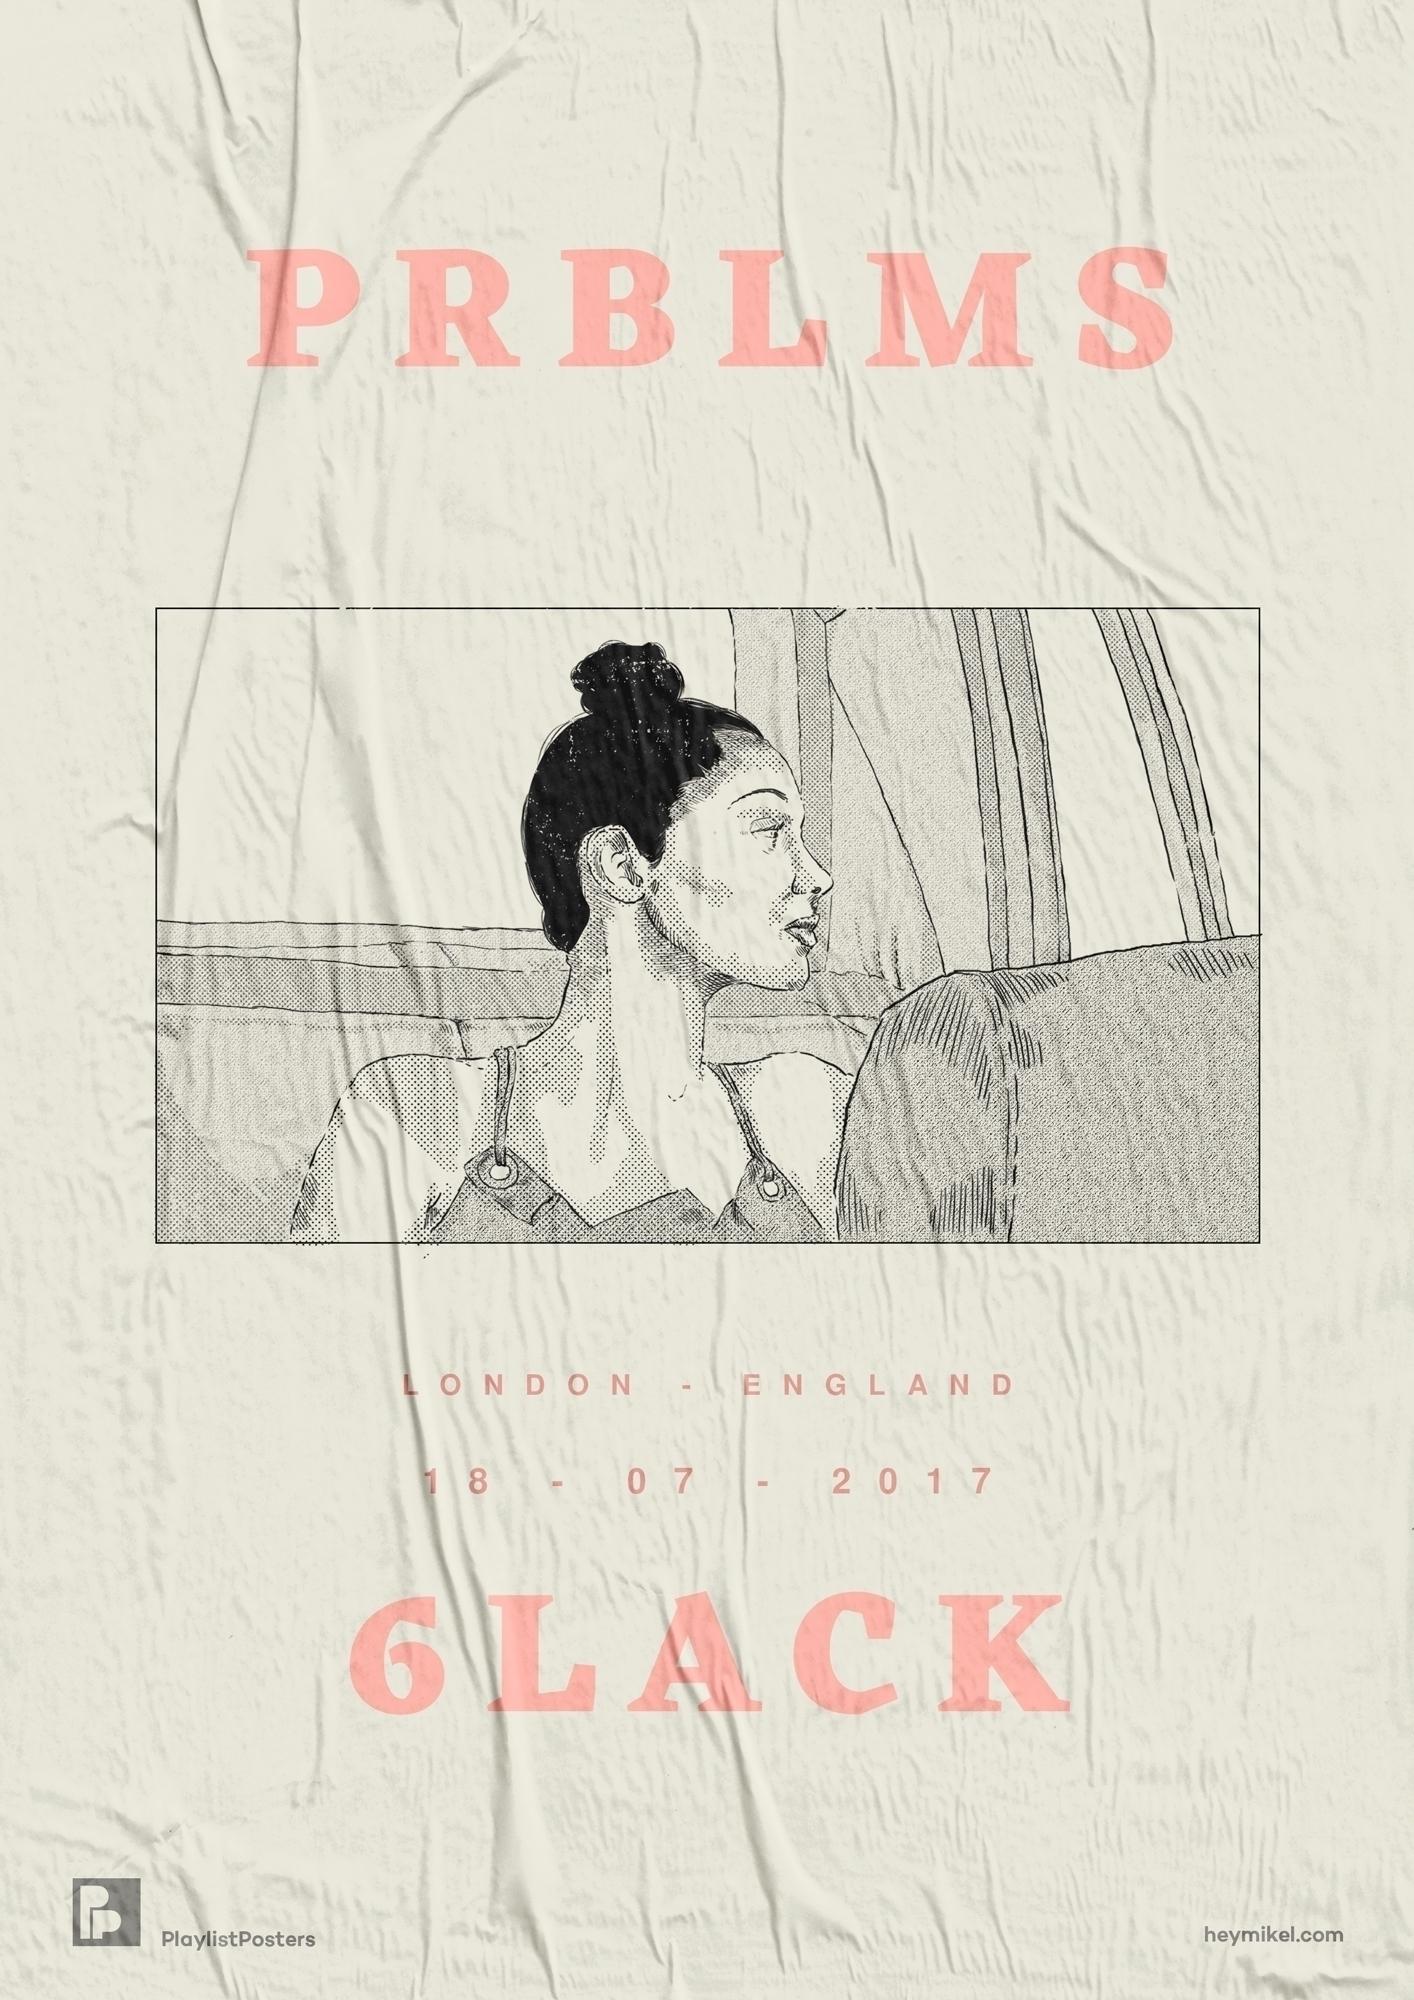 Playlist-posters // 6LACK - Prb - heymikel | ello